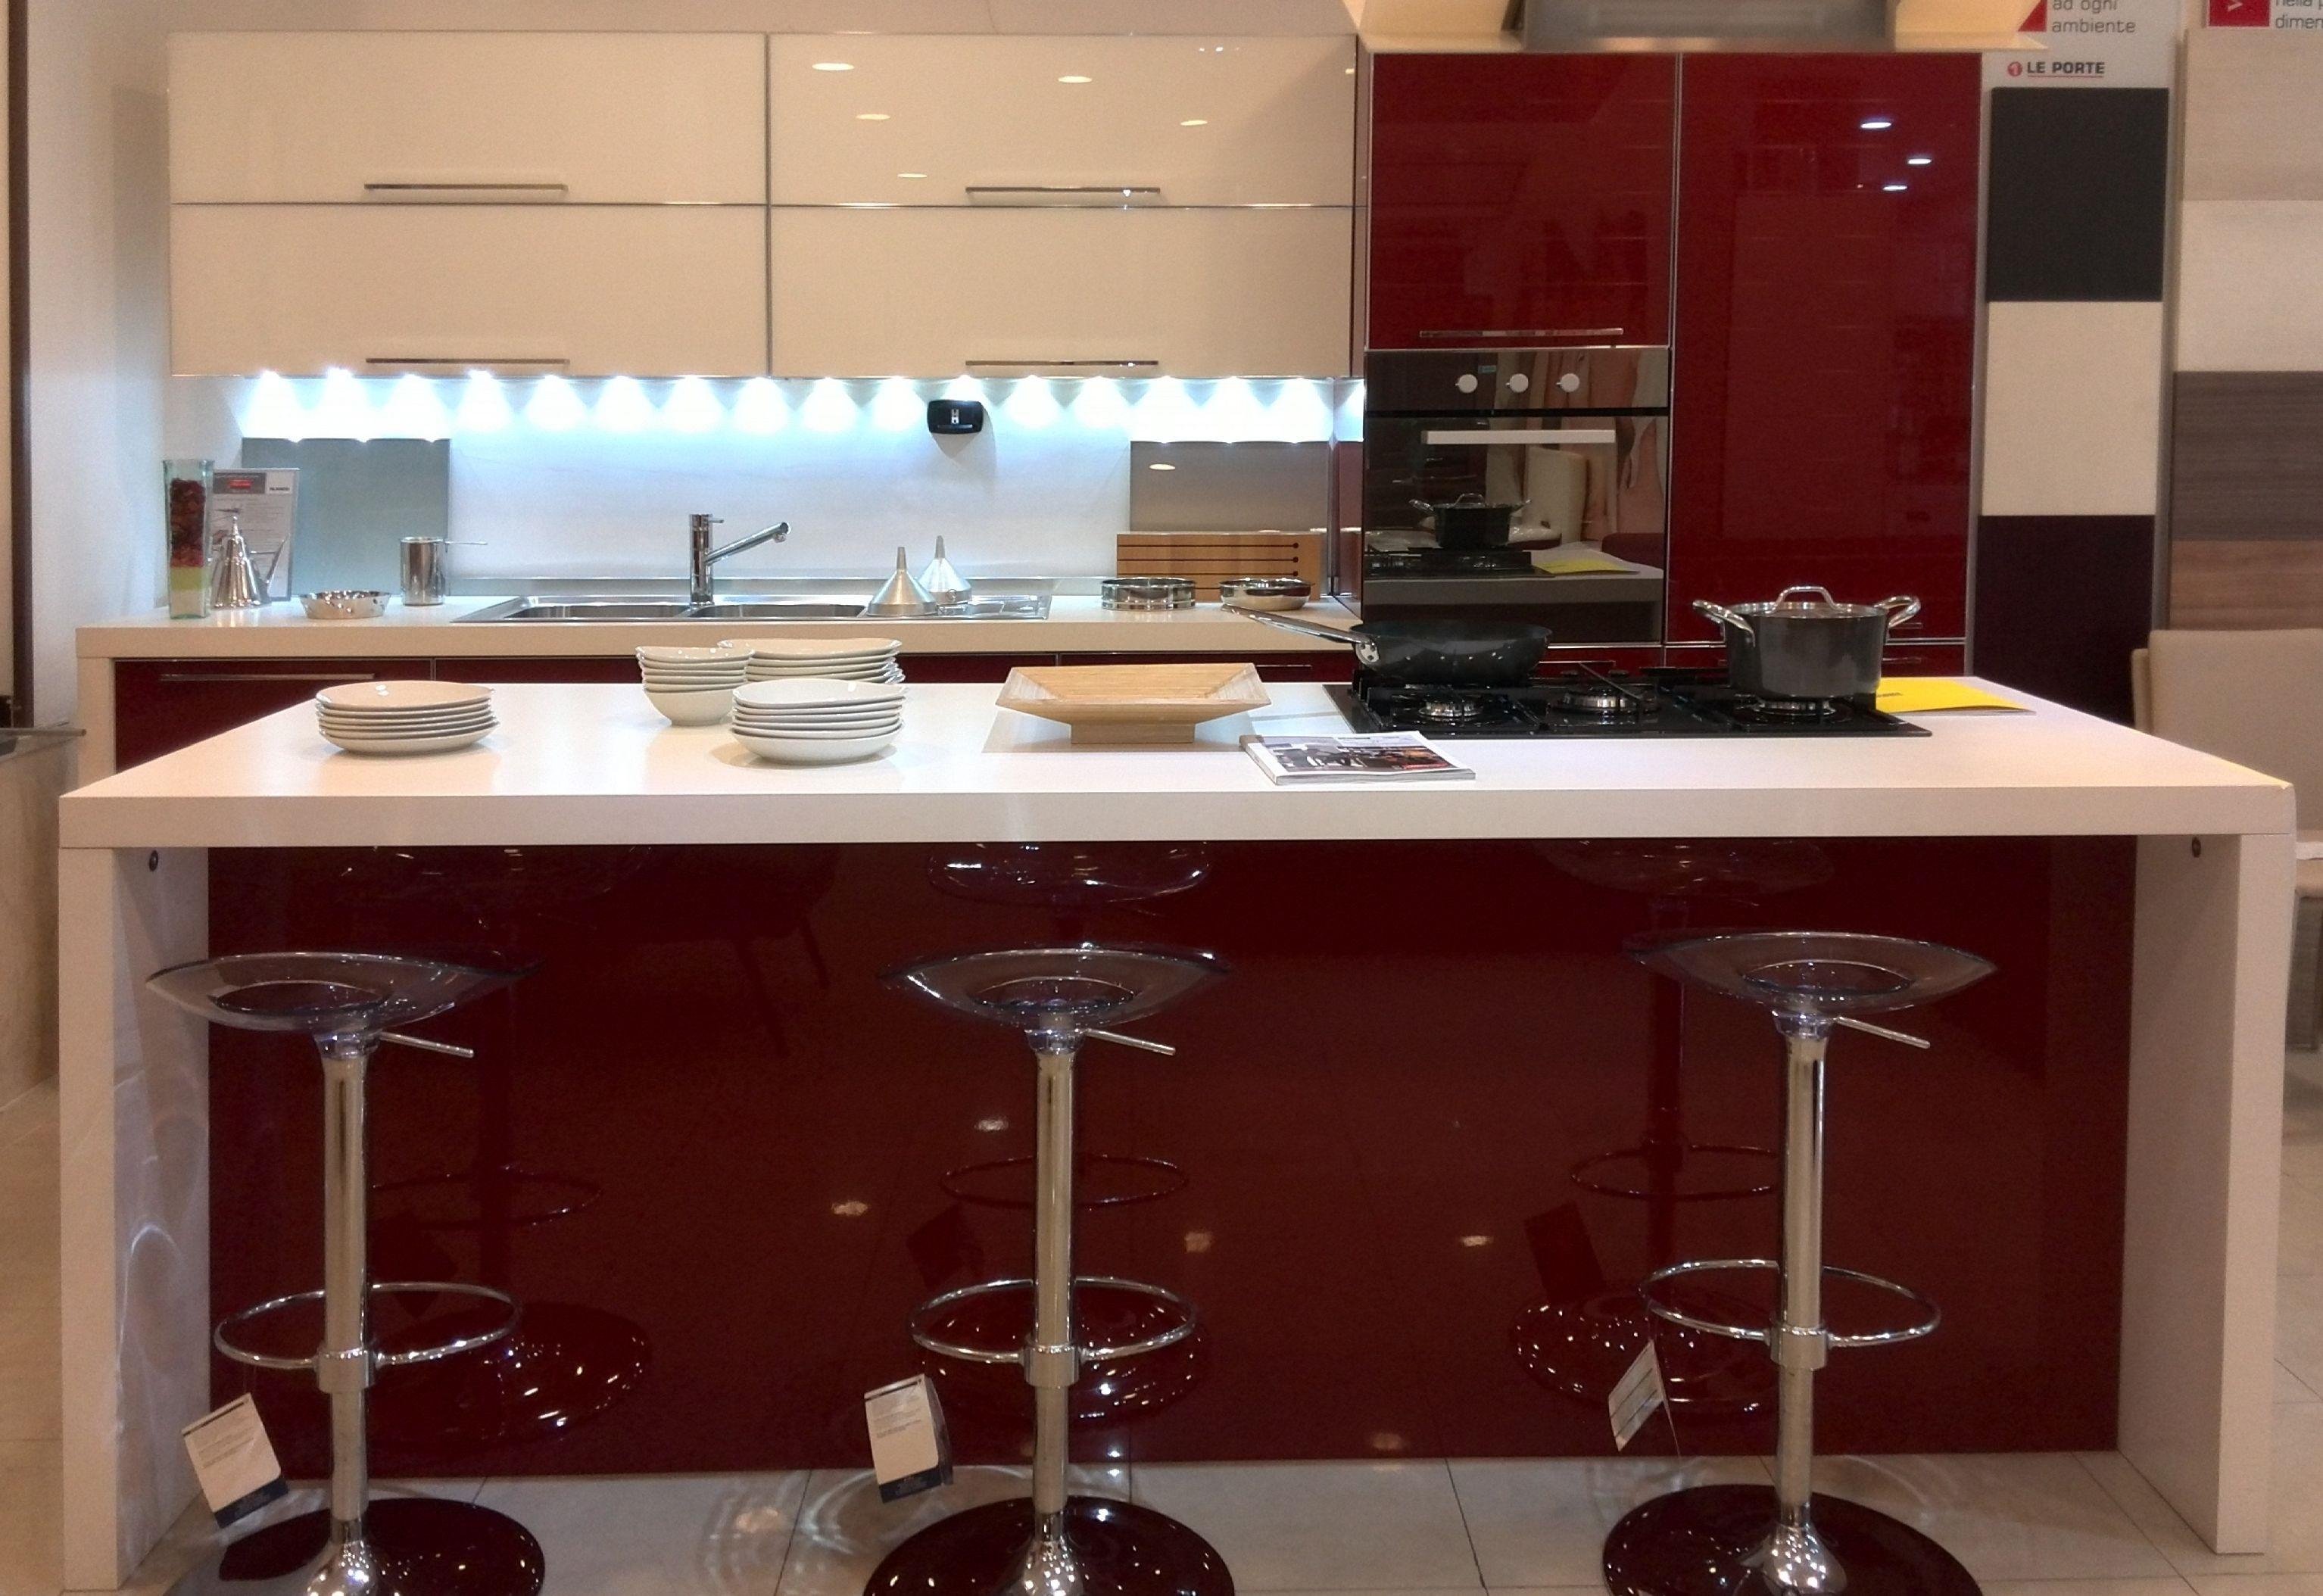 Veneta cucine offerta modello diamante moderna vetro rosso - Cucina moderna rossa ...